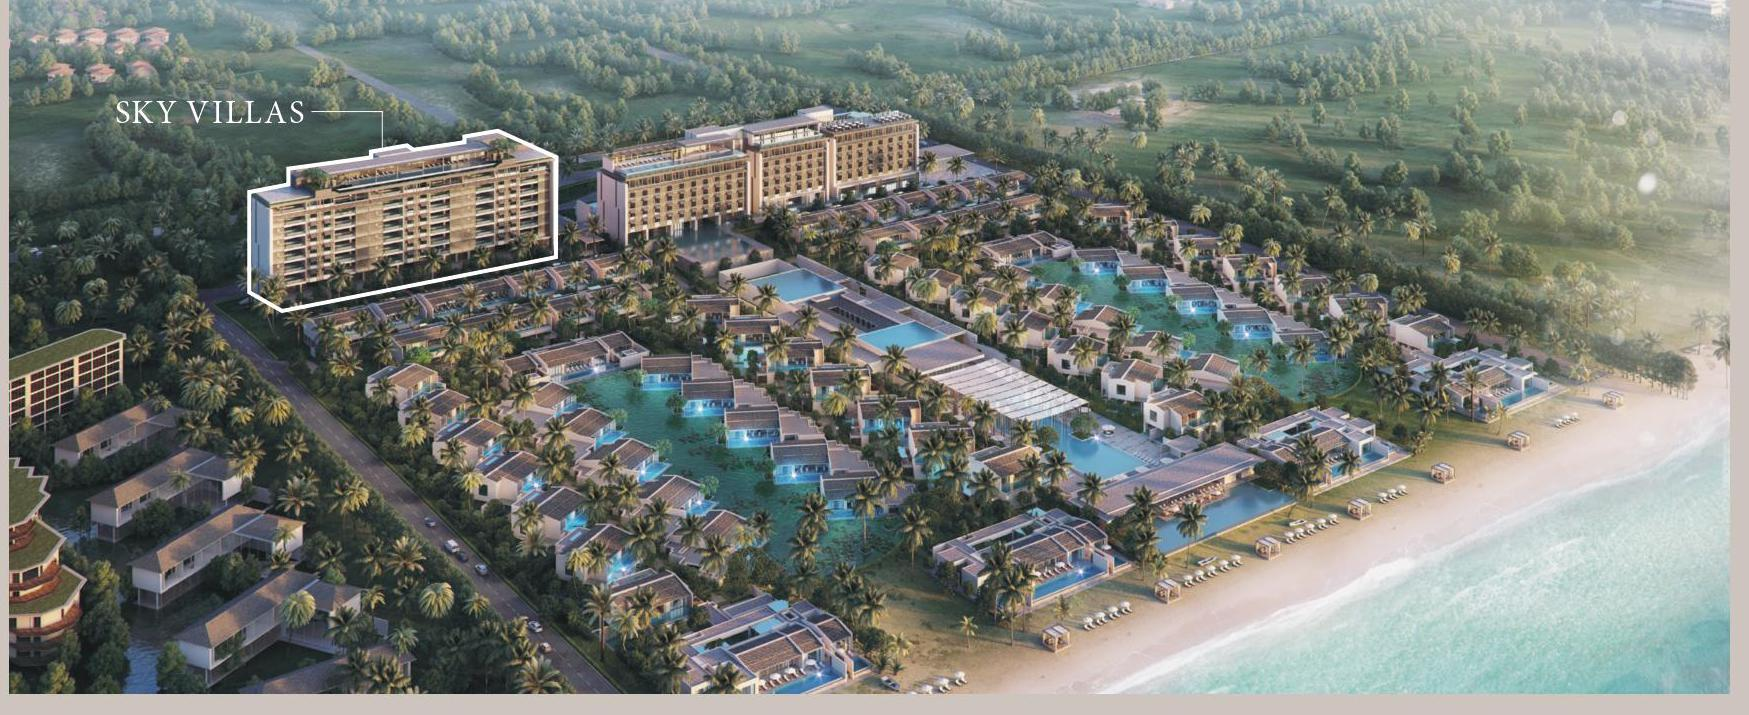 Du-an-Sky-Villas-Regent-Phu-Quoc regent phú quốc REGENT PHU QUOC RESIDENCES || Trang chính thức dự án Regent Residences Phú Quốc Du an Sky Villas Regent Phu Quoc